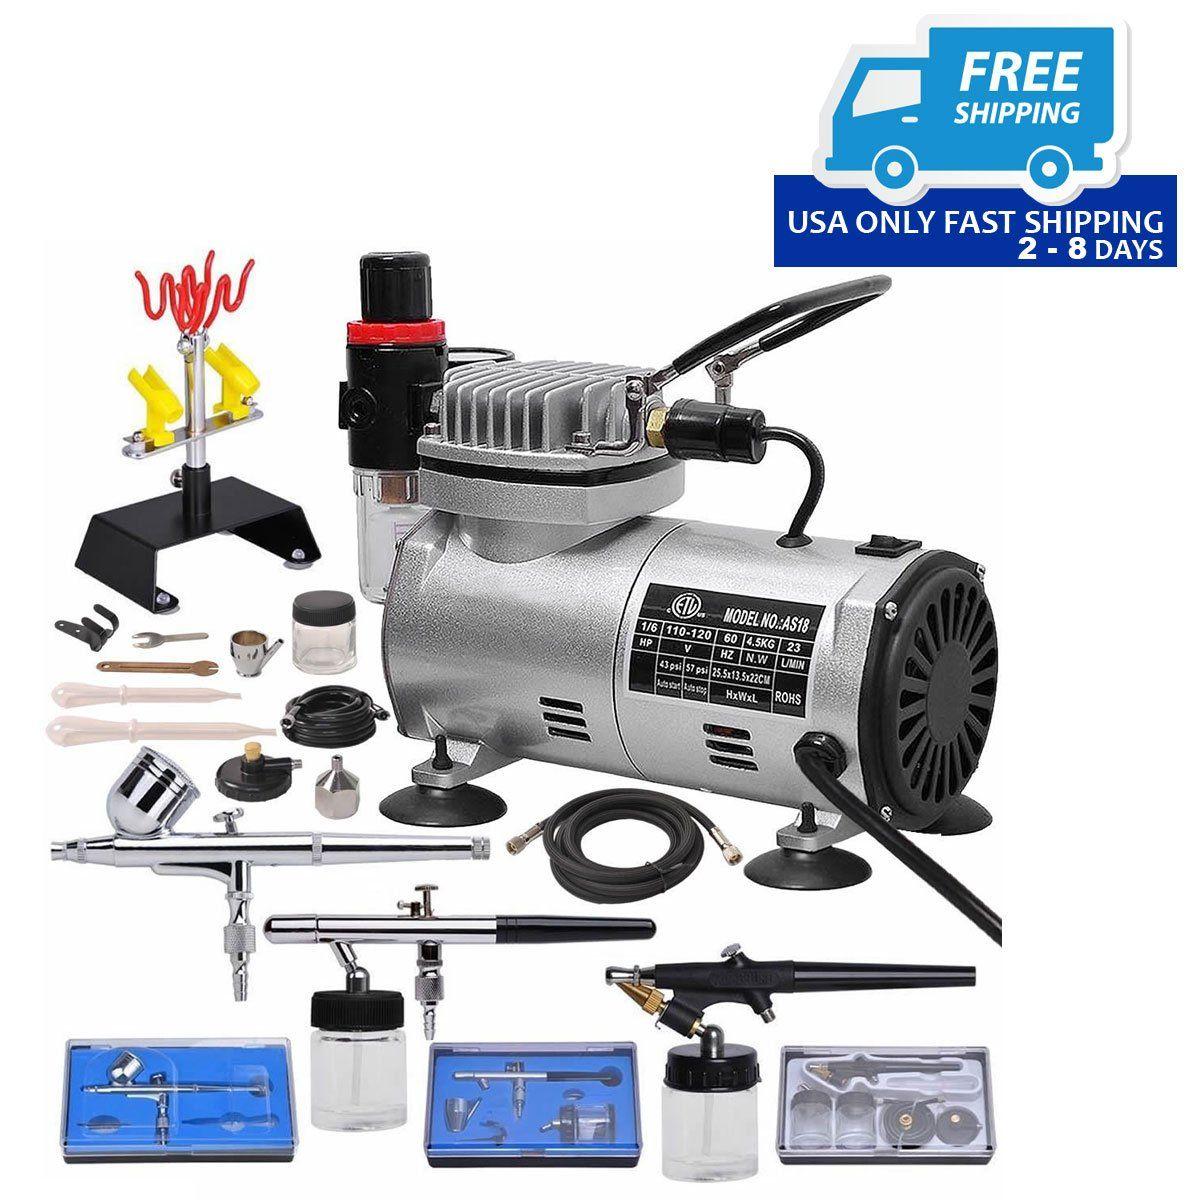 3 Airbrush & Compressor Kit DualAction Spray Air Brush